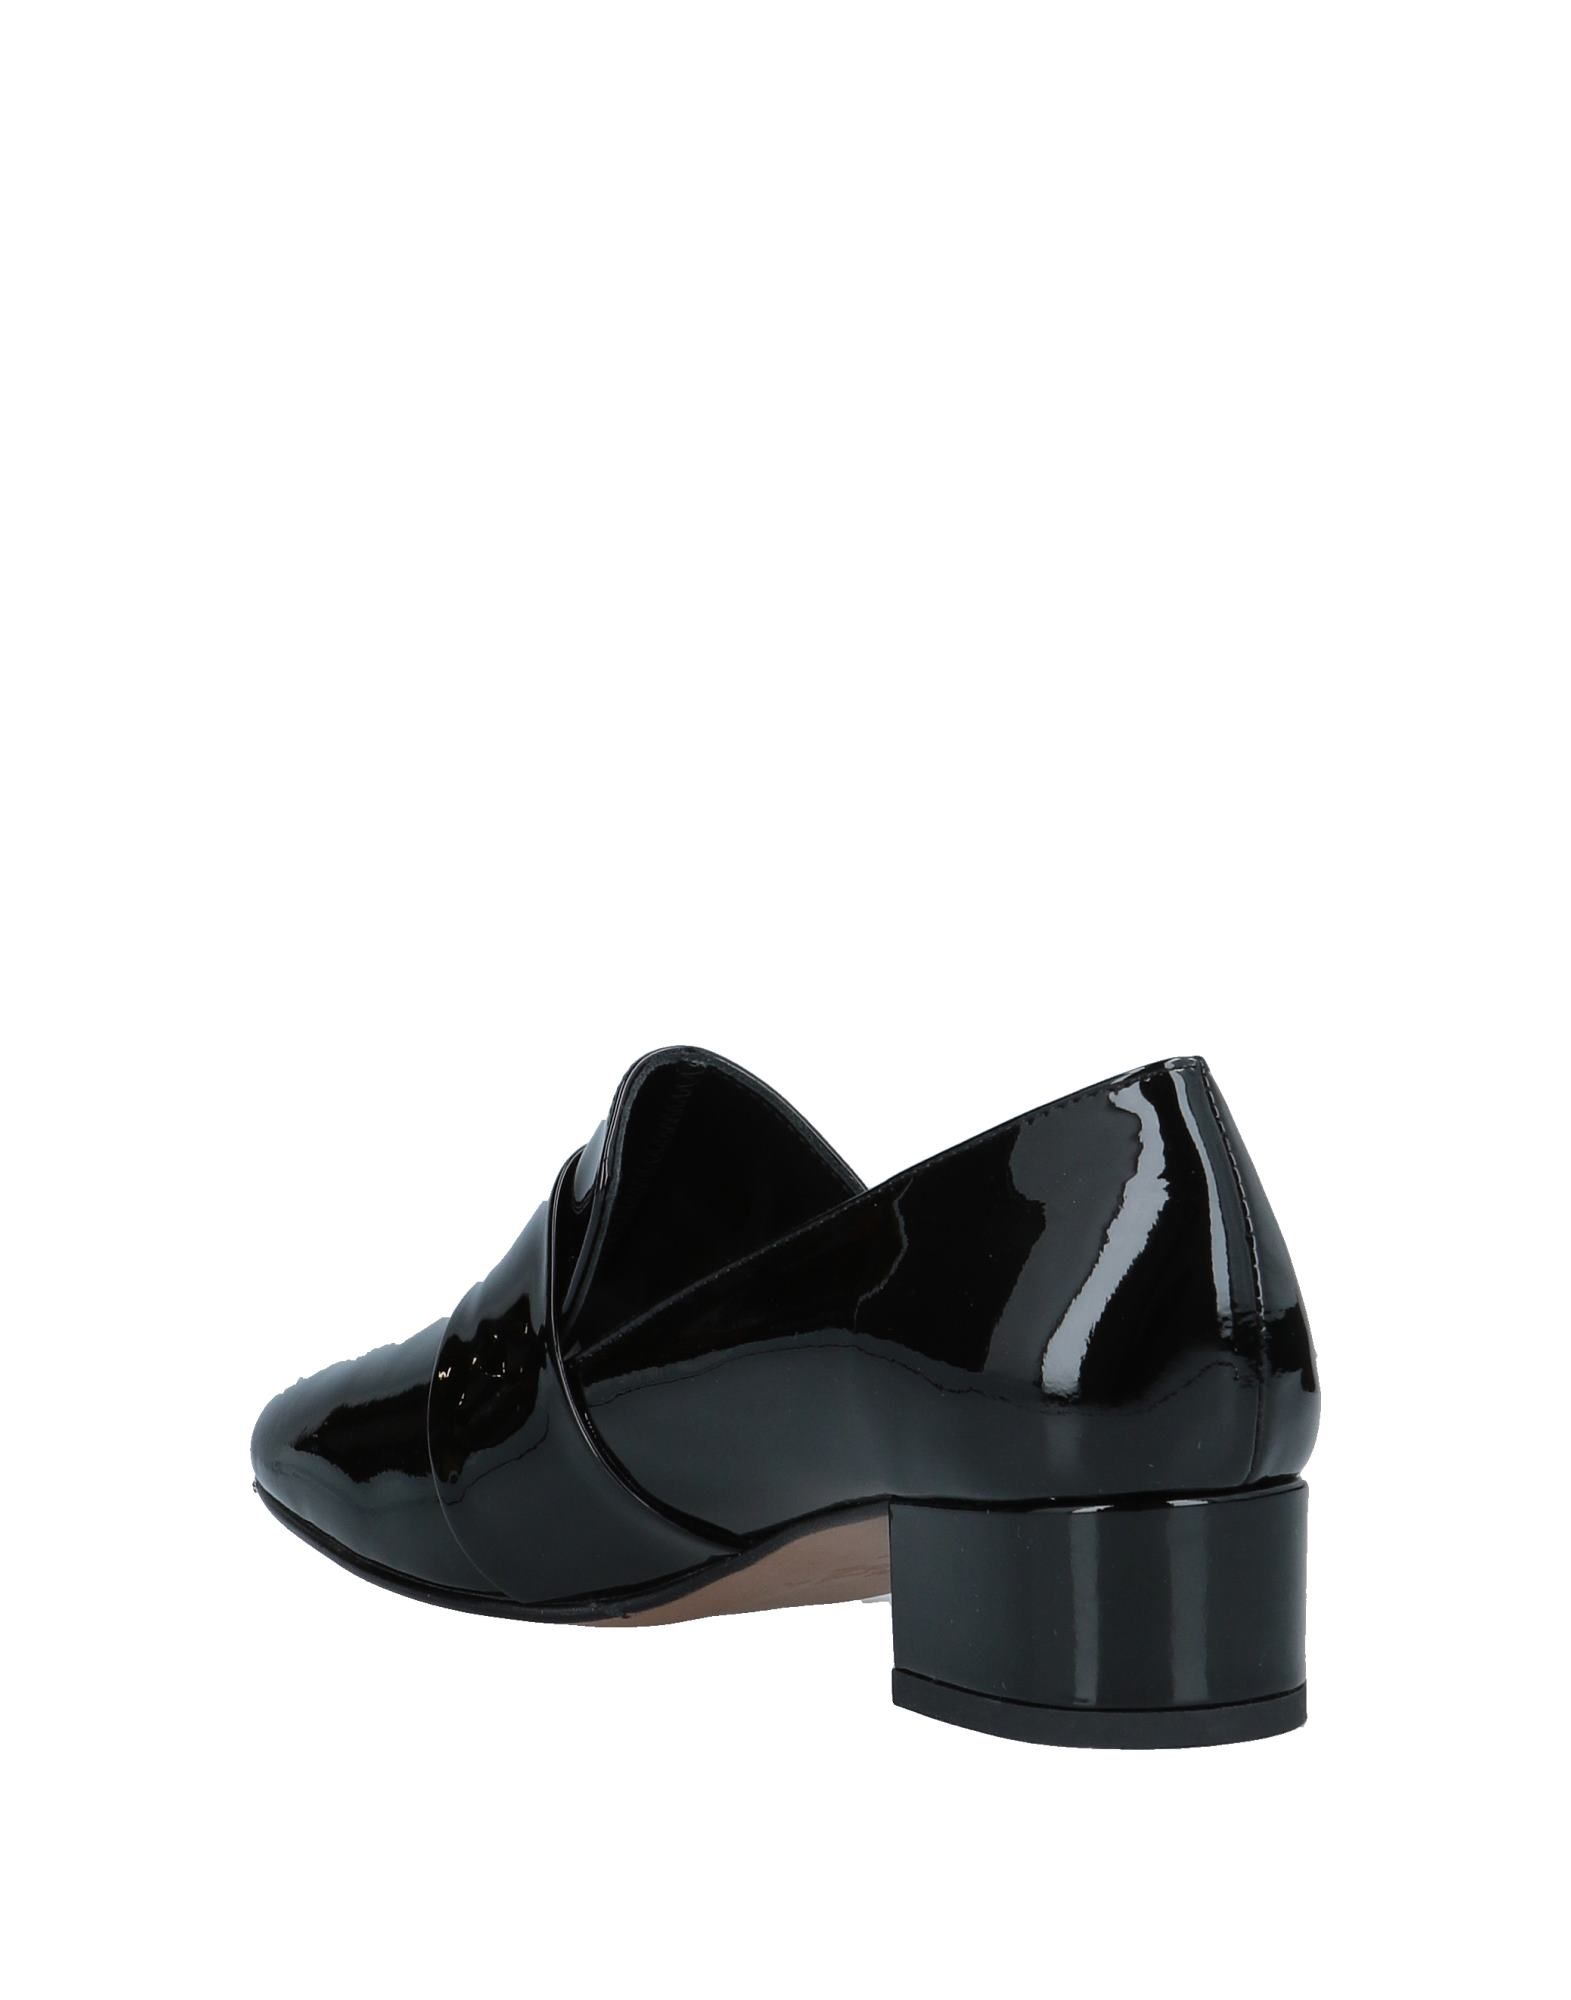 Stilvolle Mokassins billige Schuhe Griff Italia Mokassins Stilvolle Damen  11559240GM eee03f